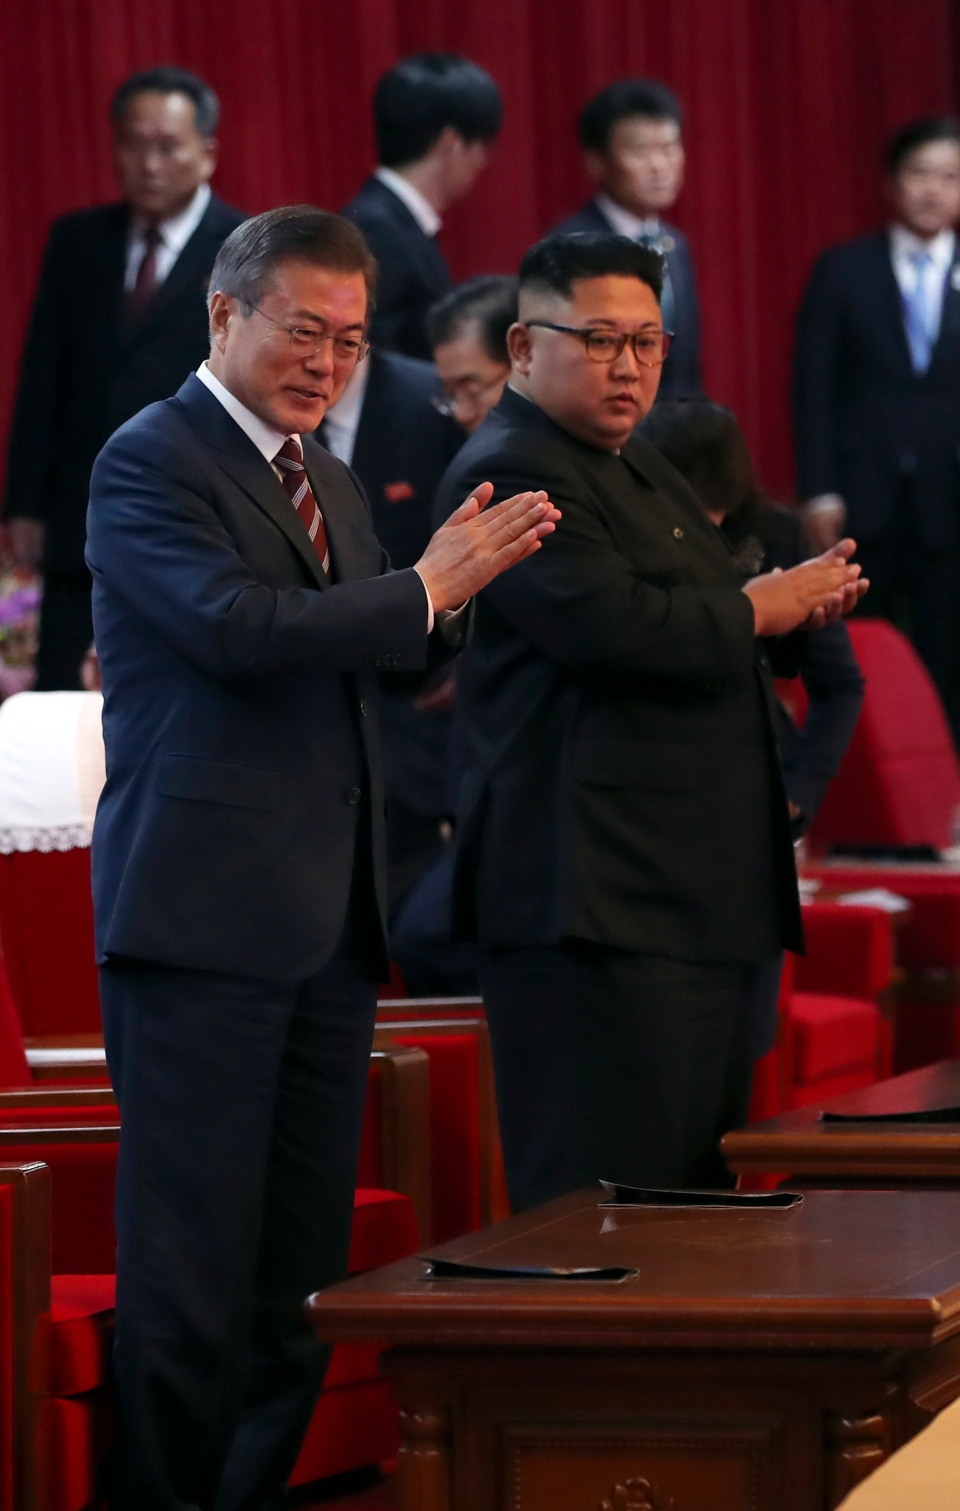 South Korean President Moon Jae-in, left, and North Korean leader Kim Jong Un arrive at the Pyongyang Grand Theatre in Pyongyang, North Korea, Tuesday, Sept. 18, 2018. (Pyongyang Press Corps Pool via AP)